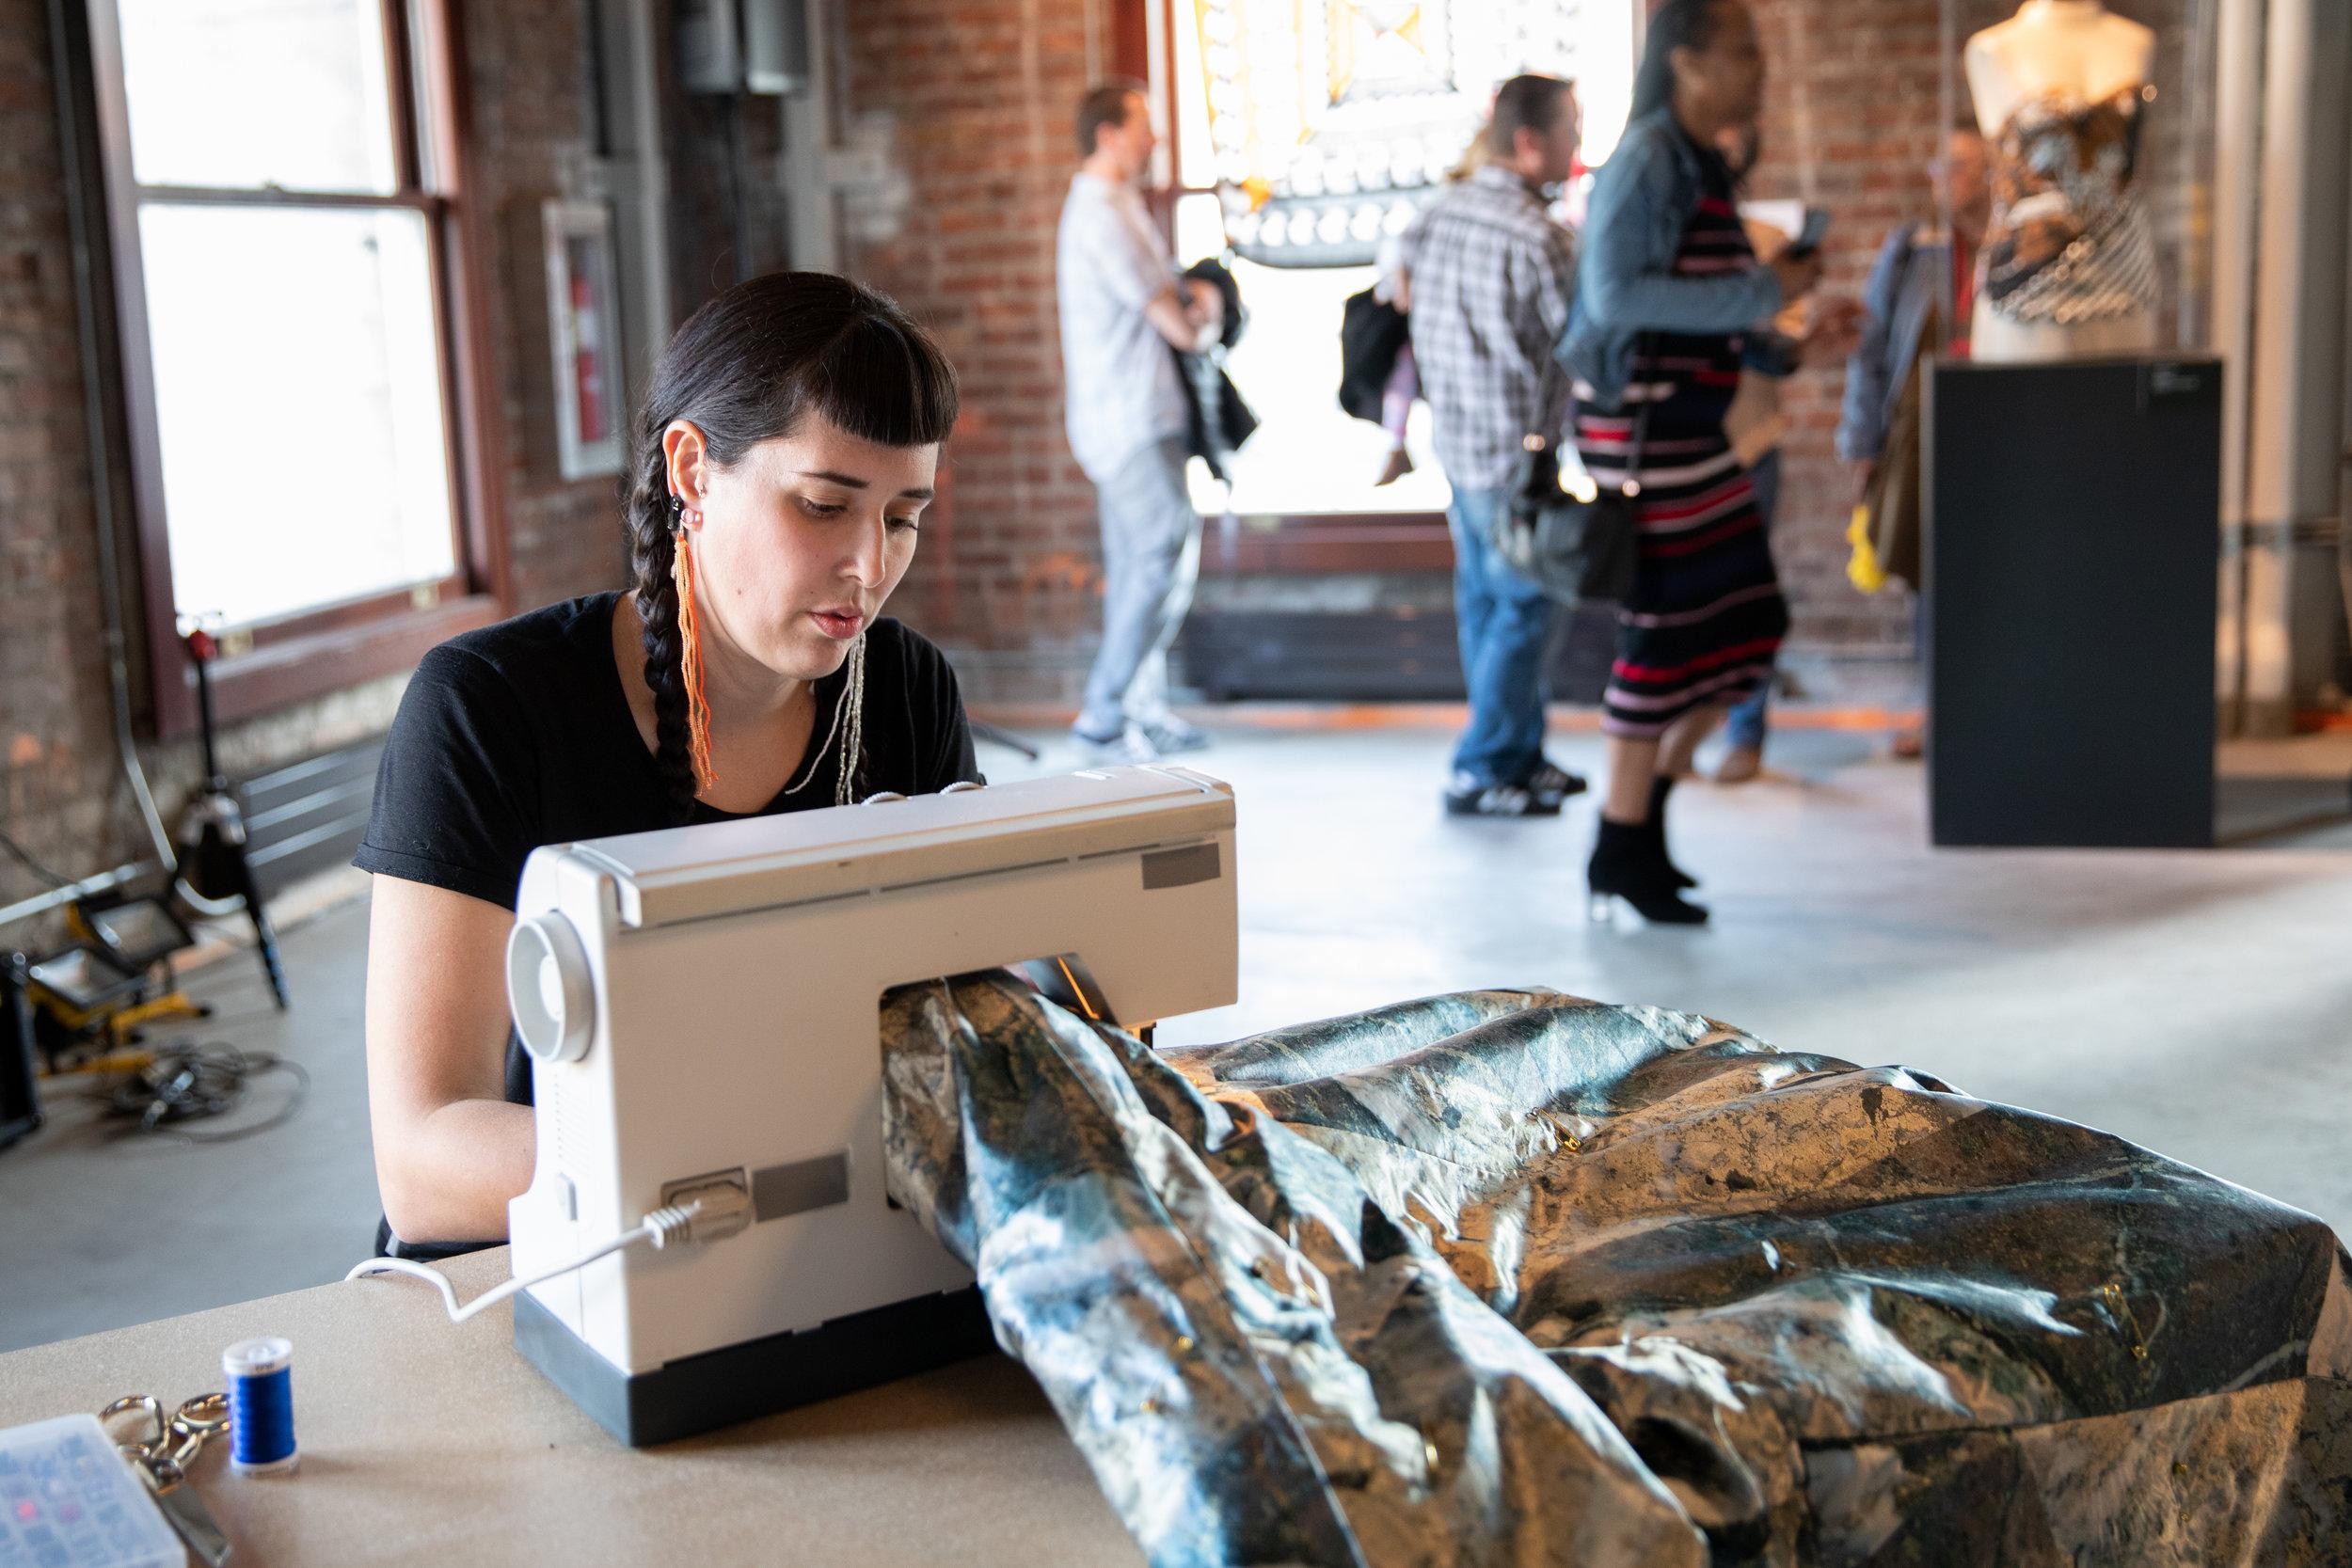 konts̱ets̱'i eł na'eneslus̱ : An echo, I am sewing (performance documentation)